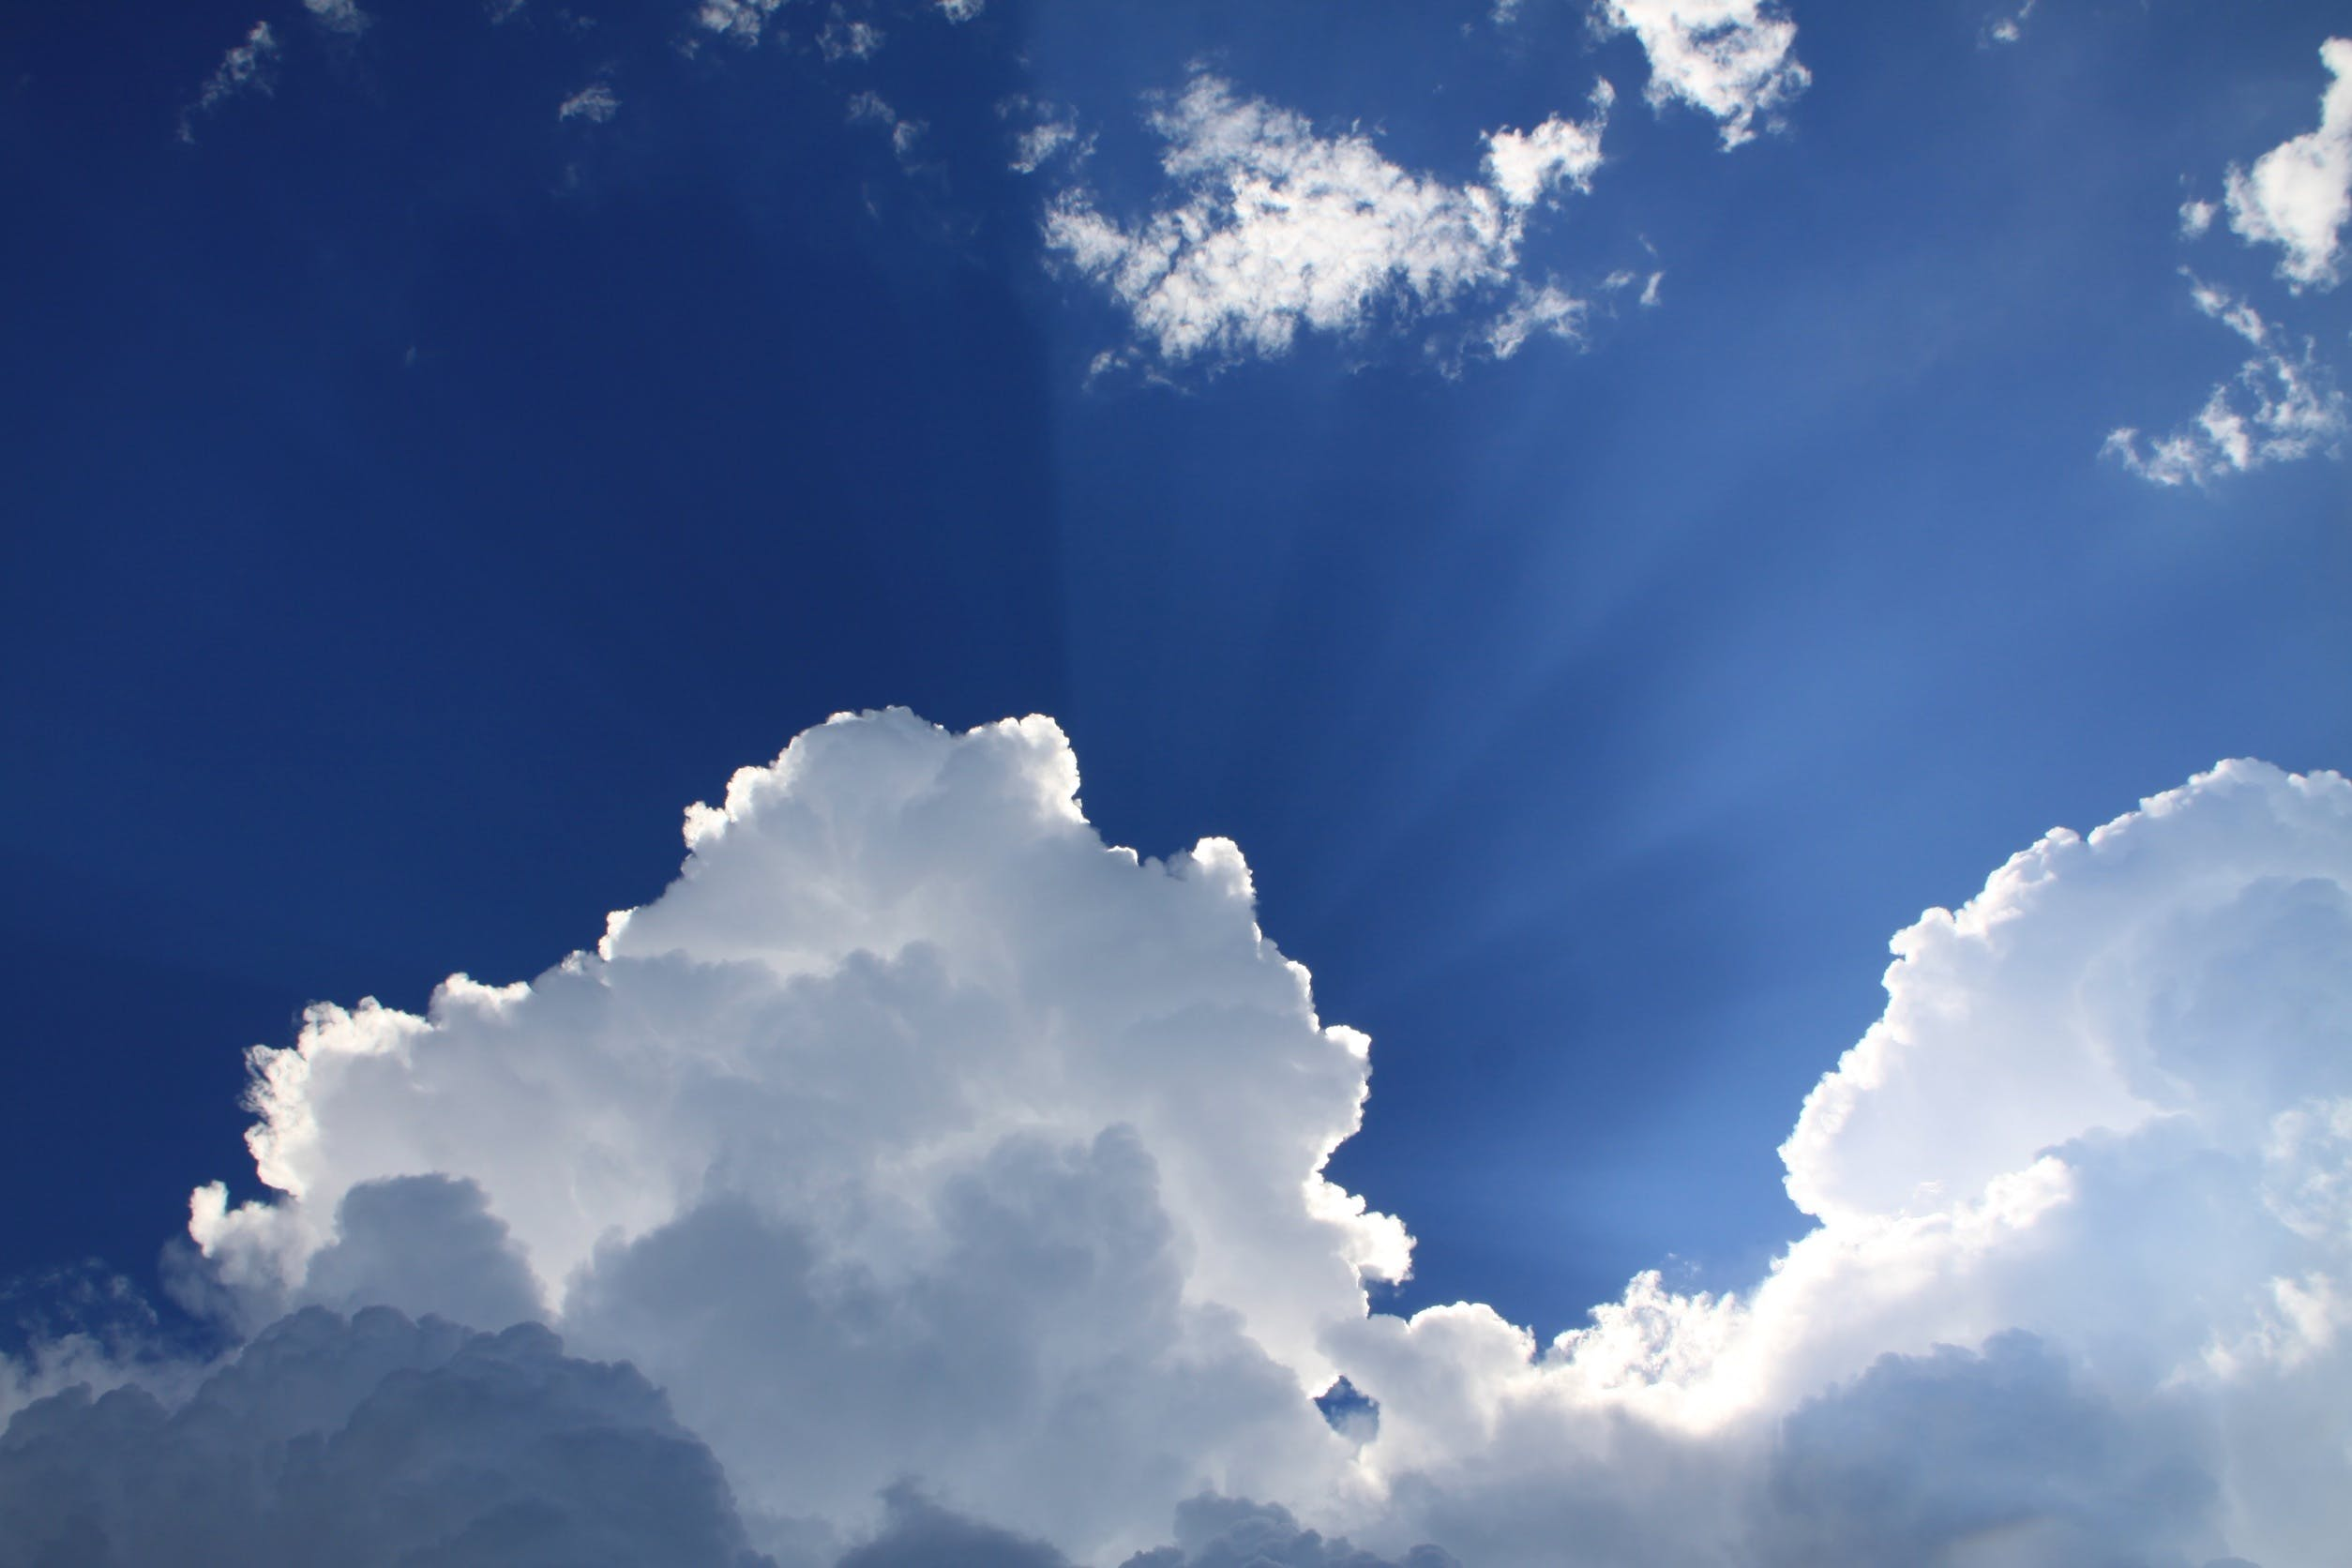 Free stock photo of sky, clouds, blue, sunbeams